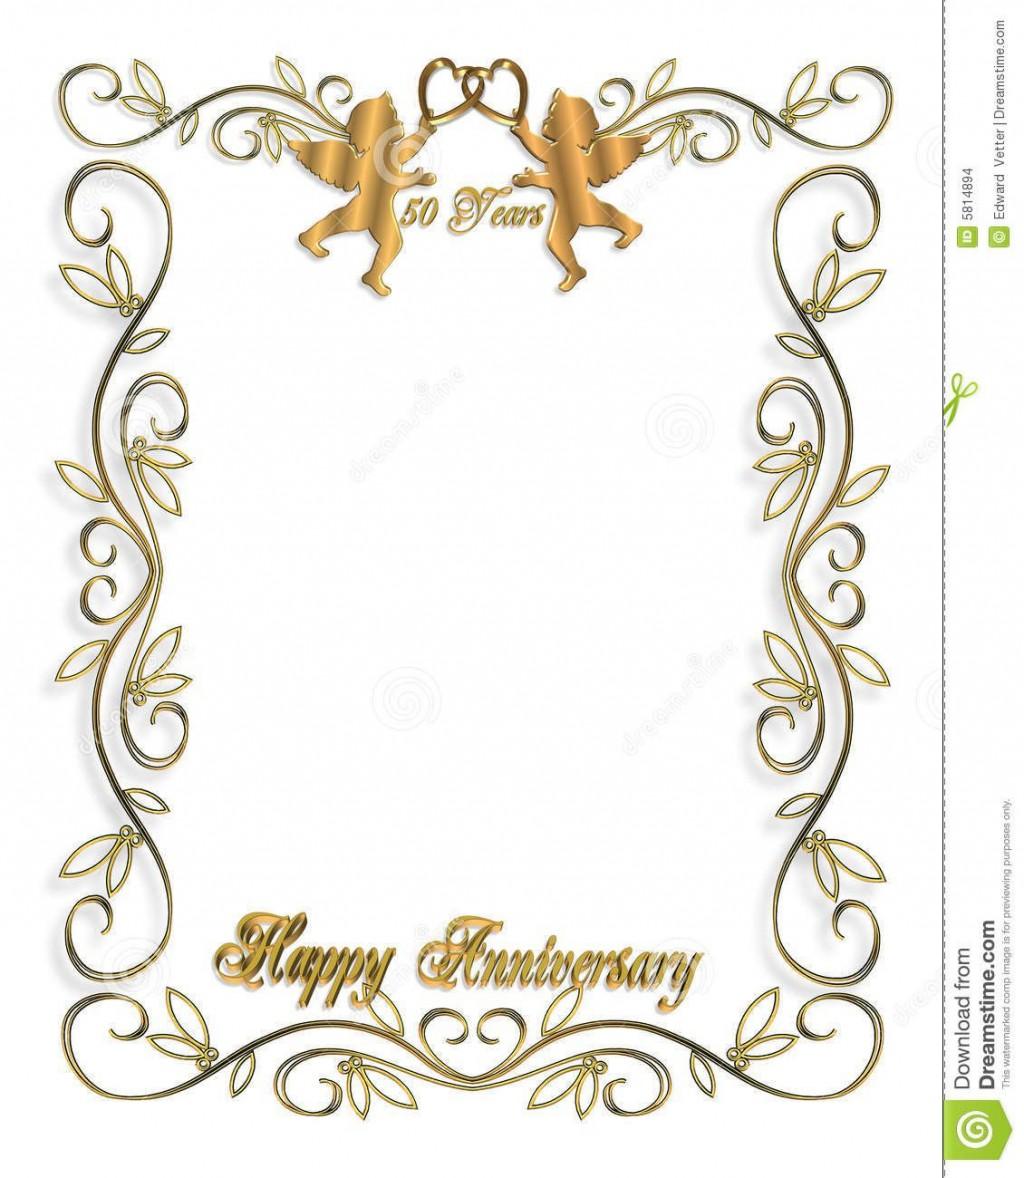 010 Striking 50th Wedding Anniversary Invitation Template Free Download Inspiration  GoldenLarge